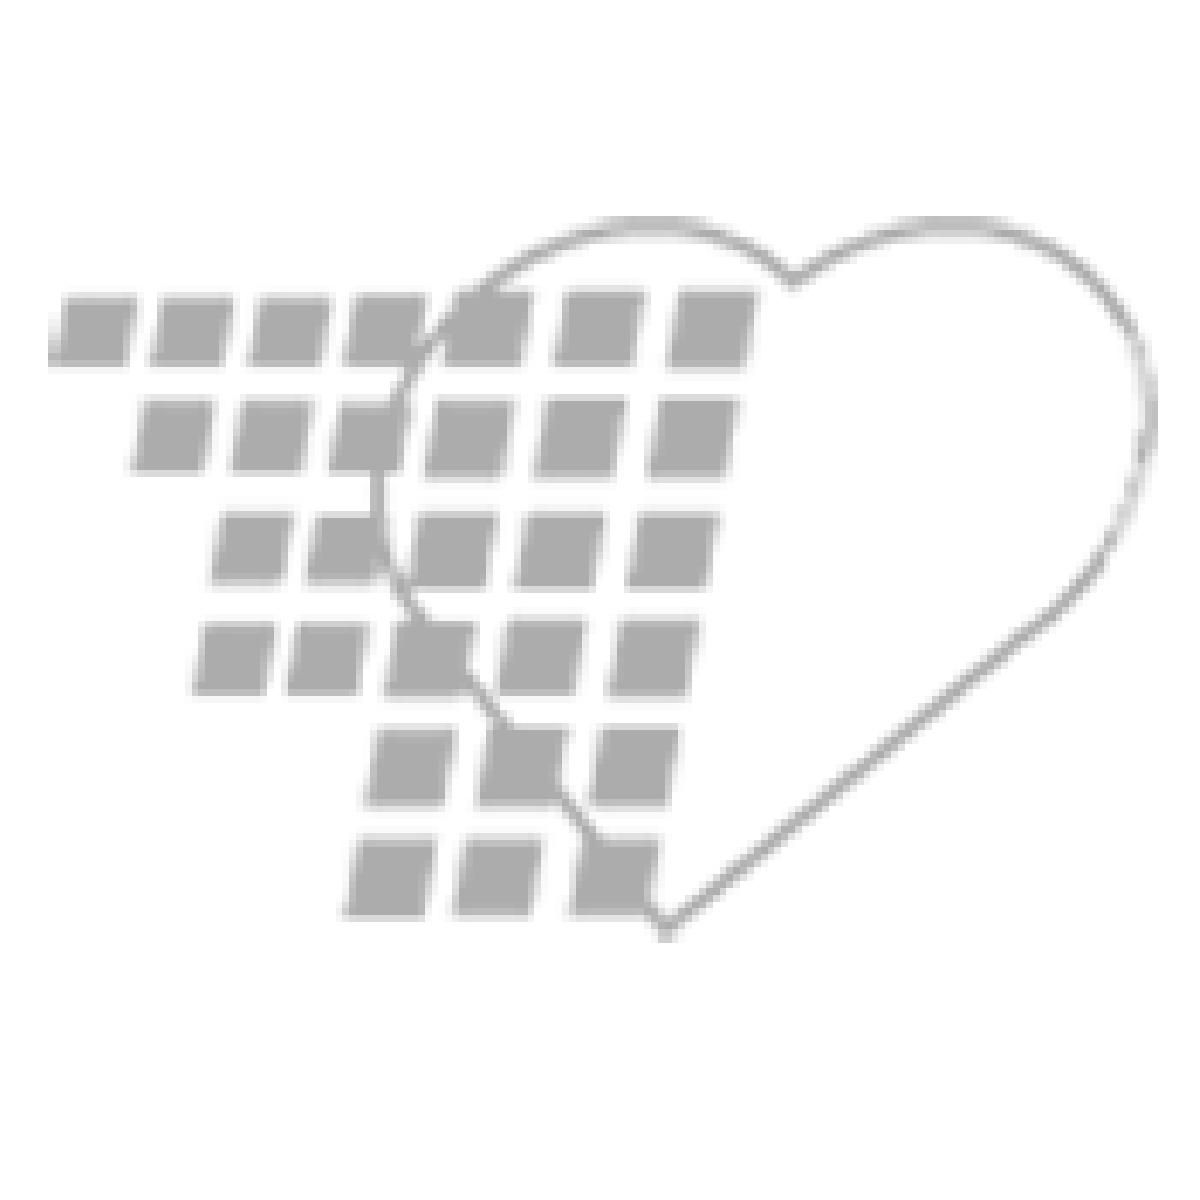 02-19-1108 - Quickvue Combo hCG Test